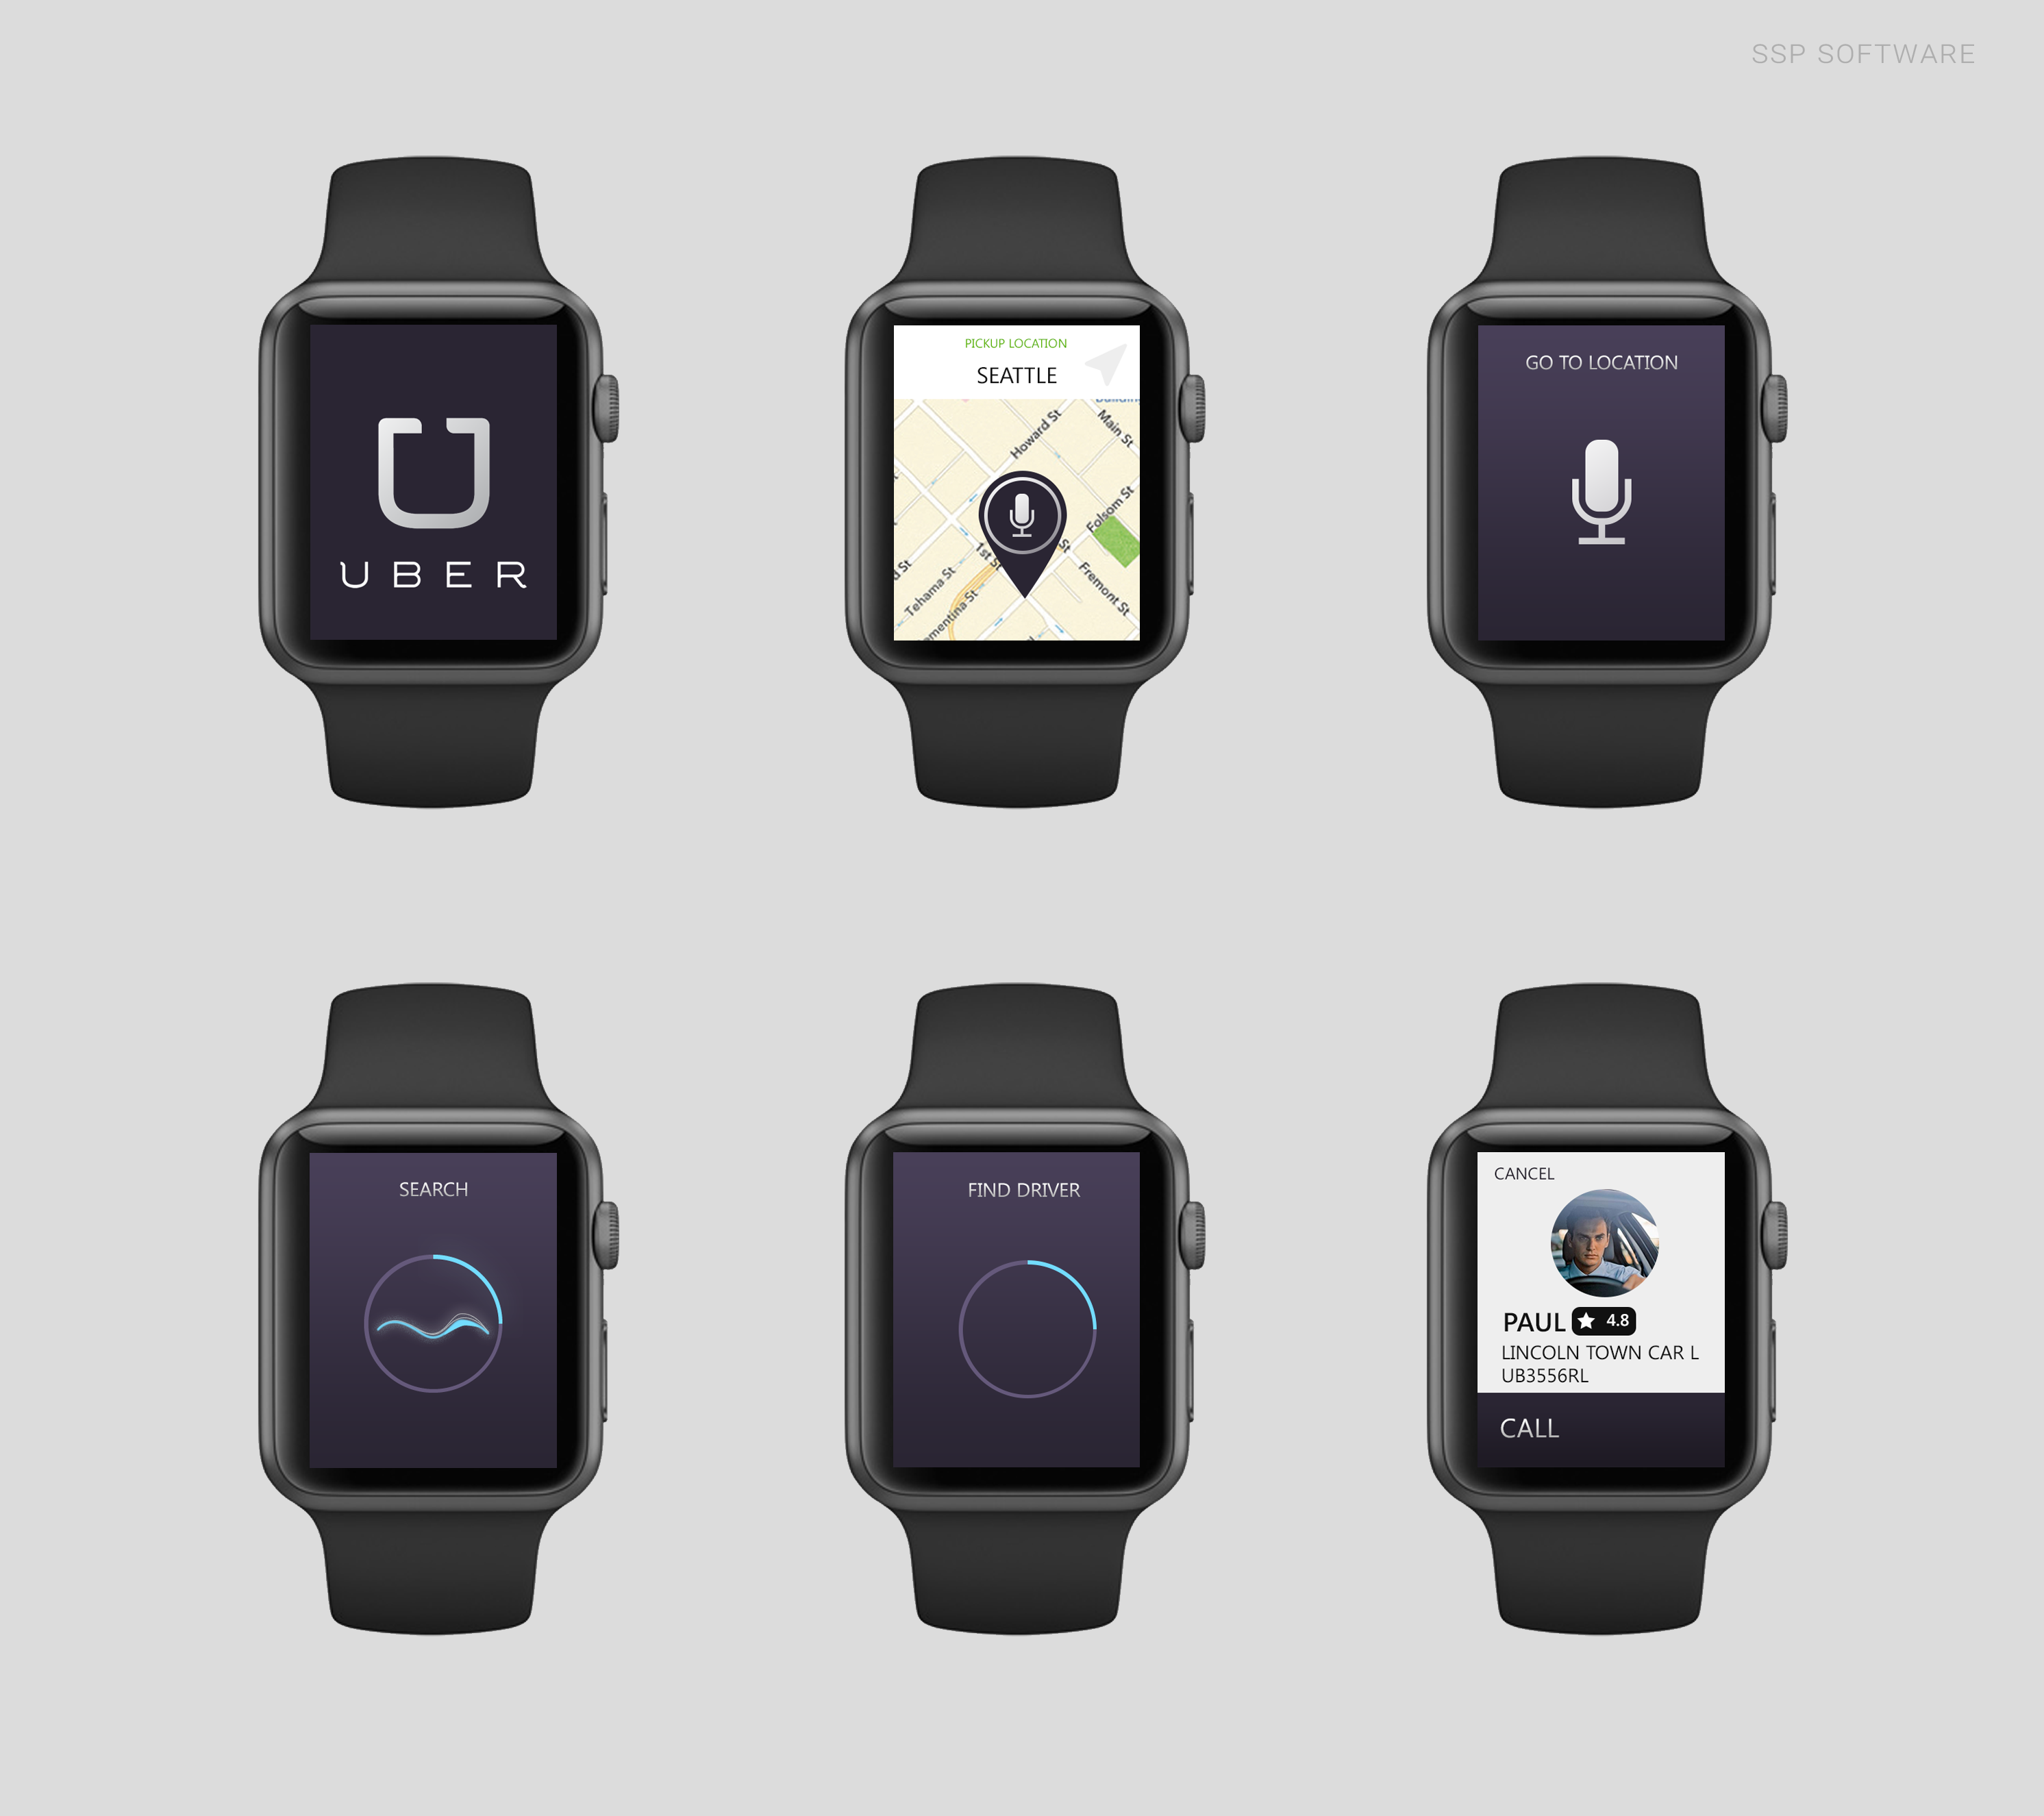 Conceito de app para o Applw Watch - Uber